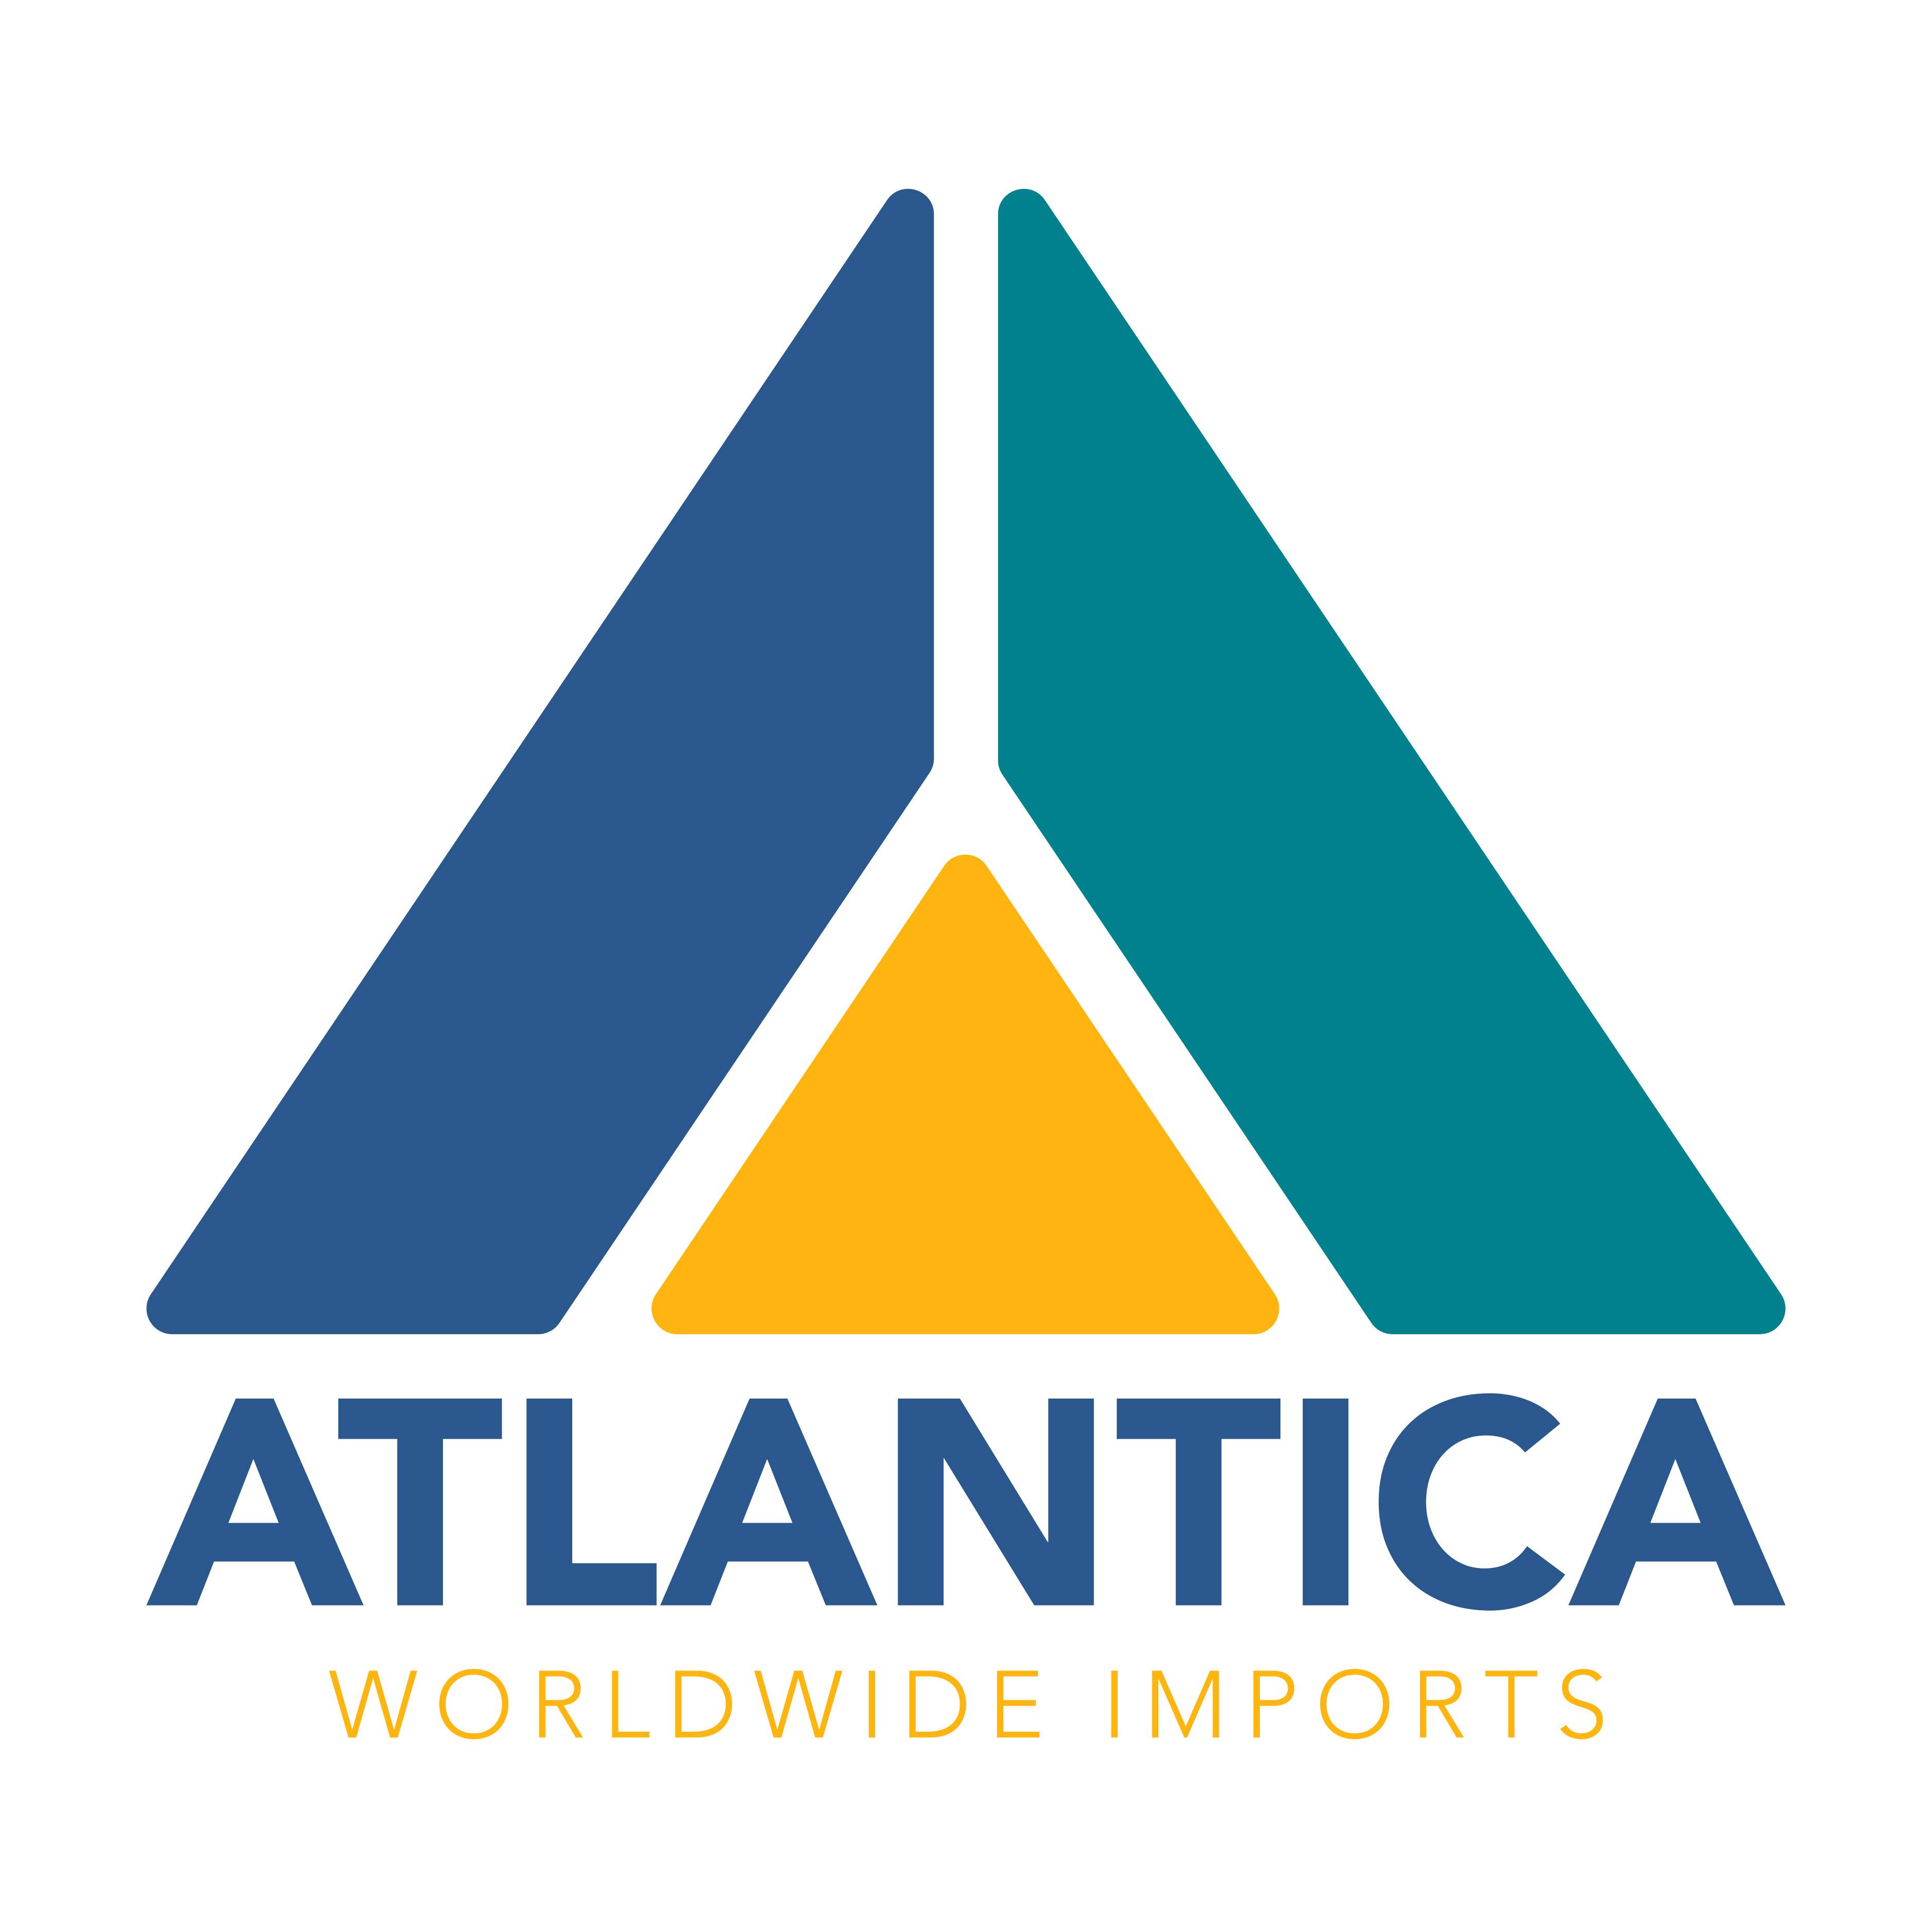 Atlantica Worldwide Imports